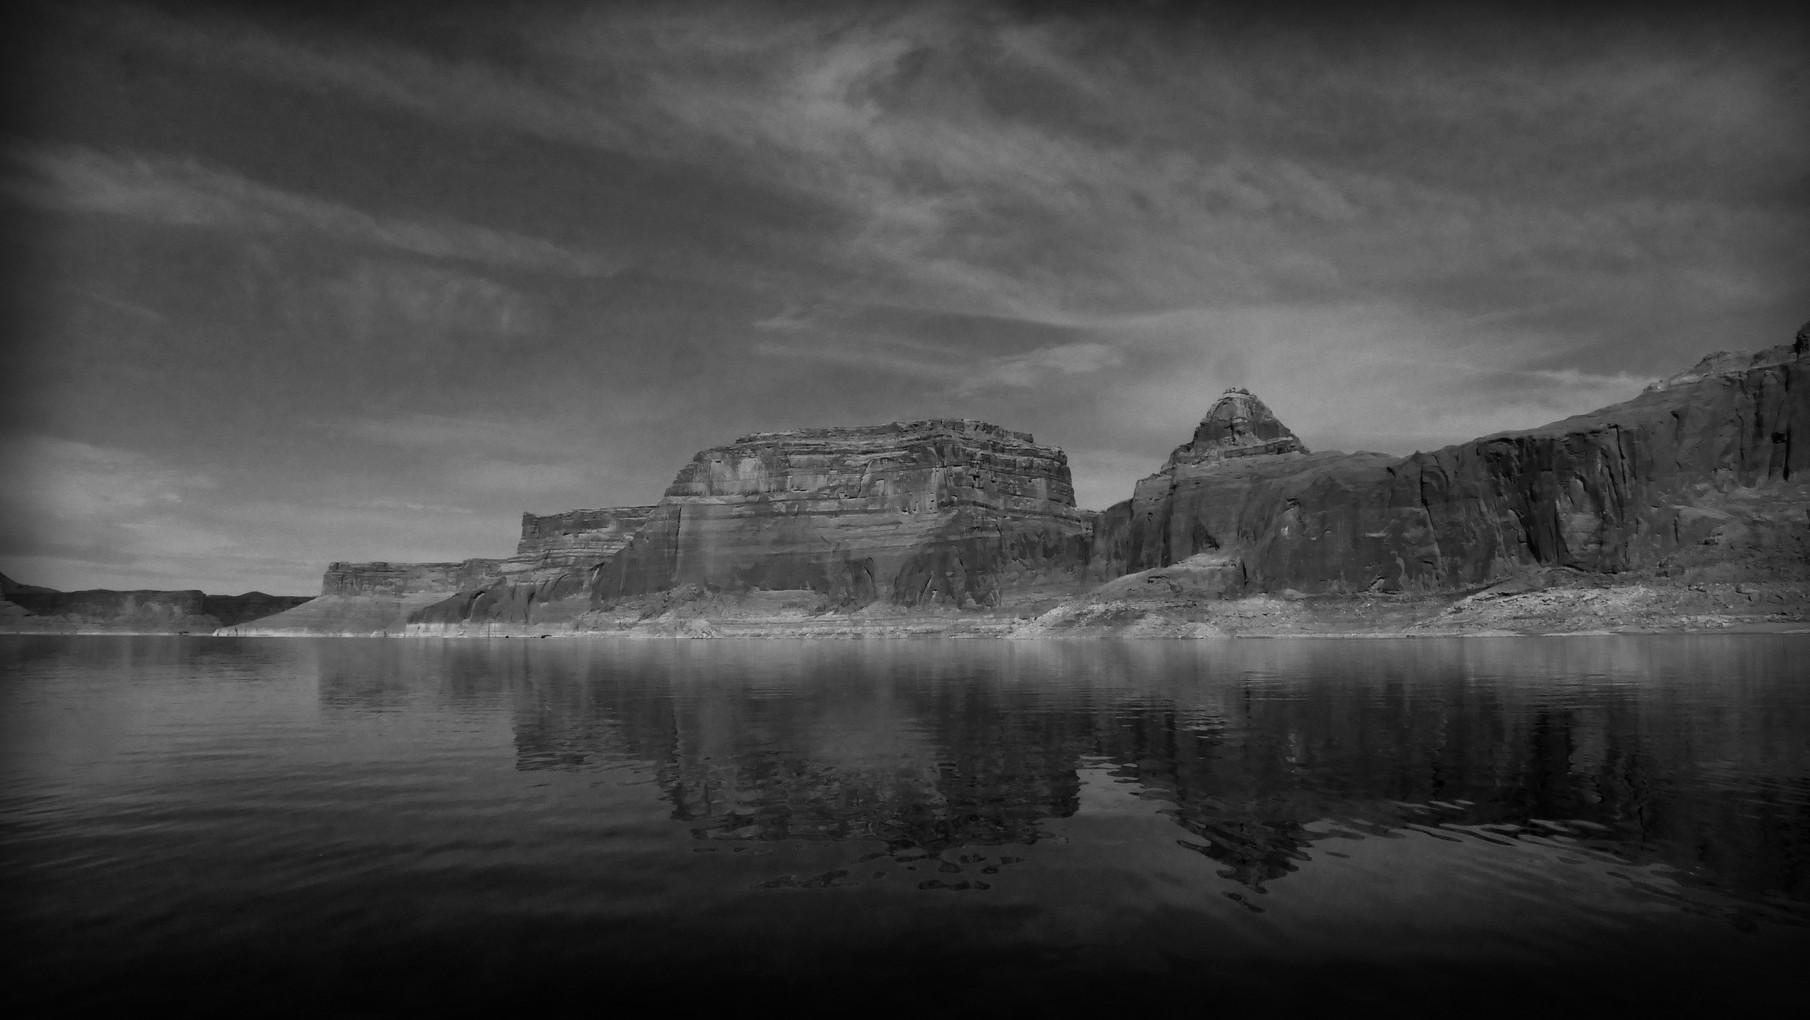 25-lake-powell-reflection-valley.jpg